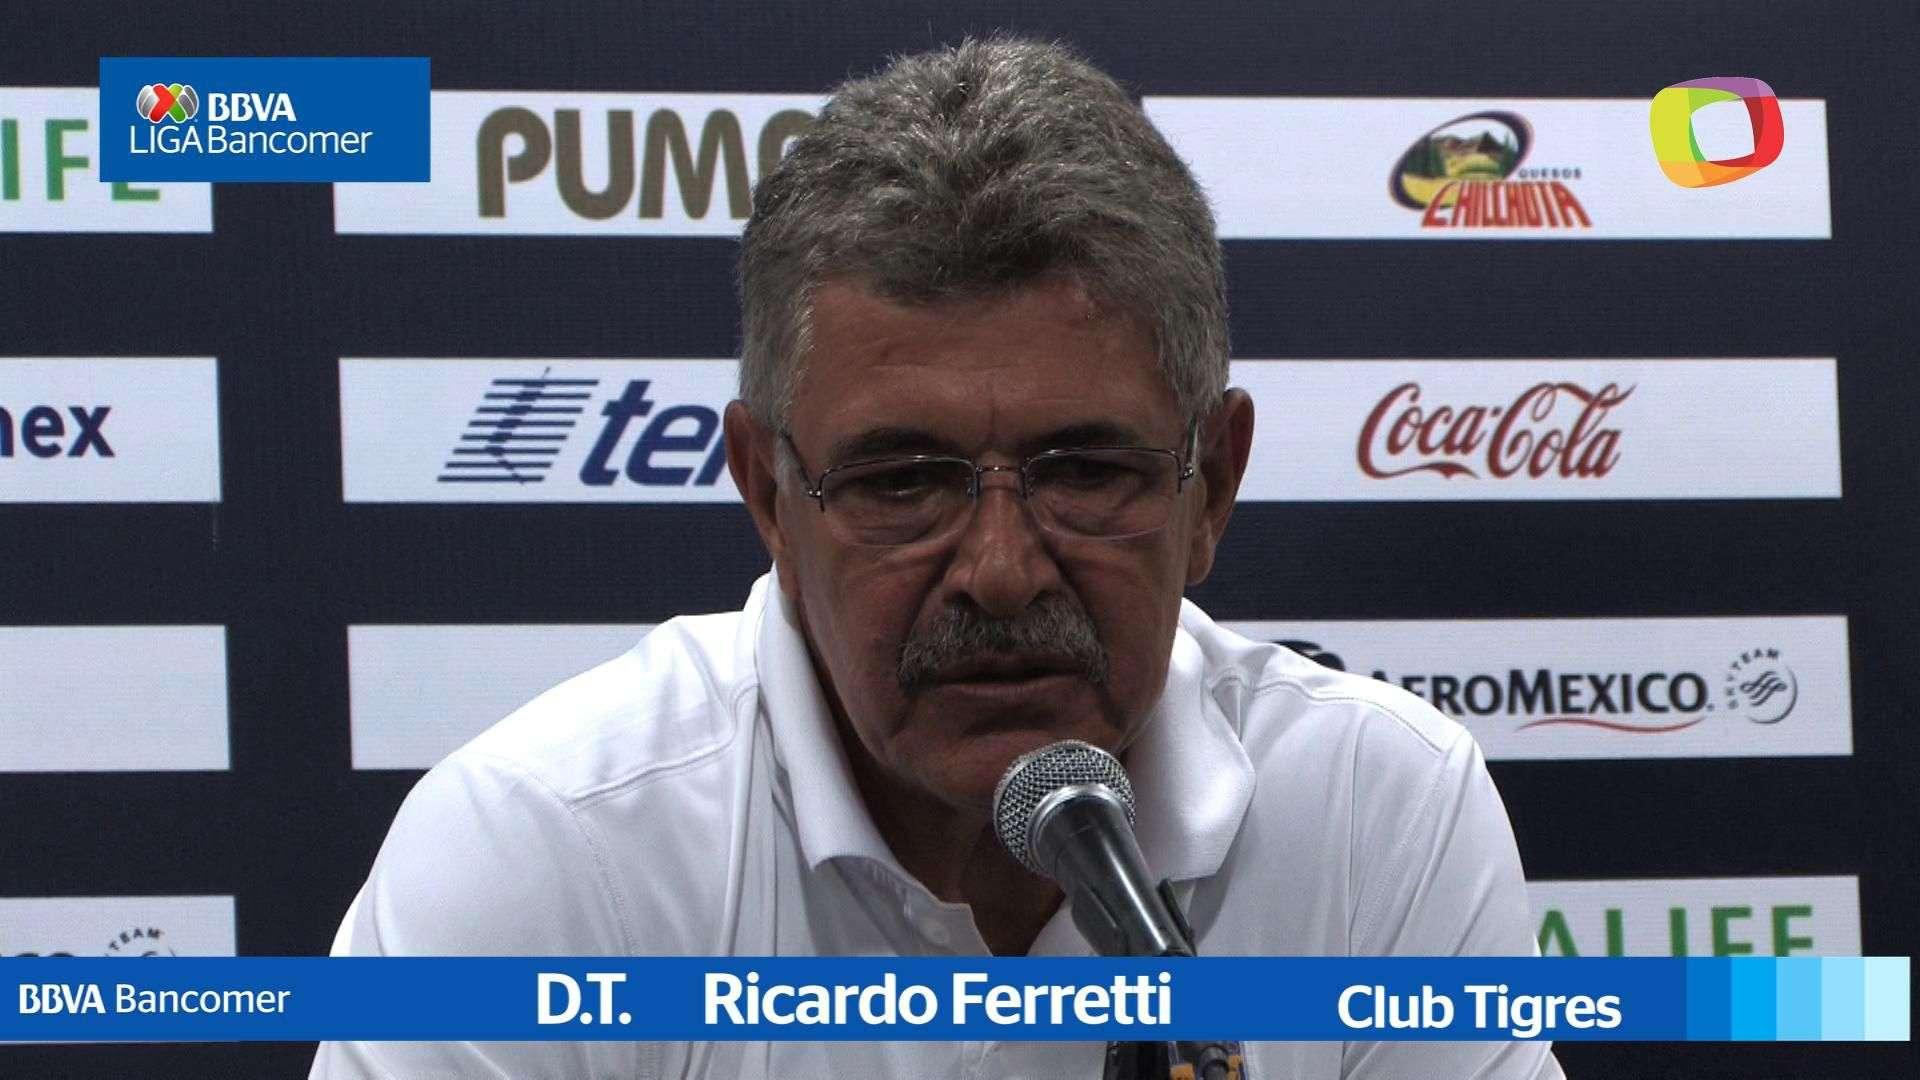 Jornada 8 Ricardo Ferretti, Pumas 2-2 Tigres, Apertura 2014